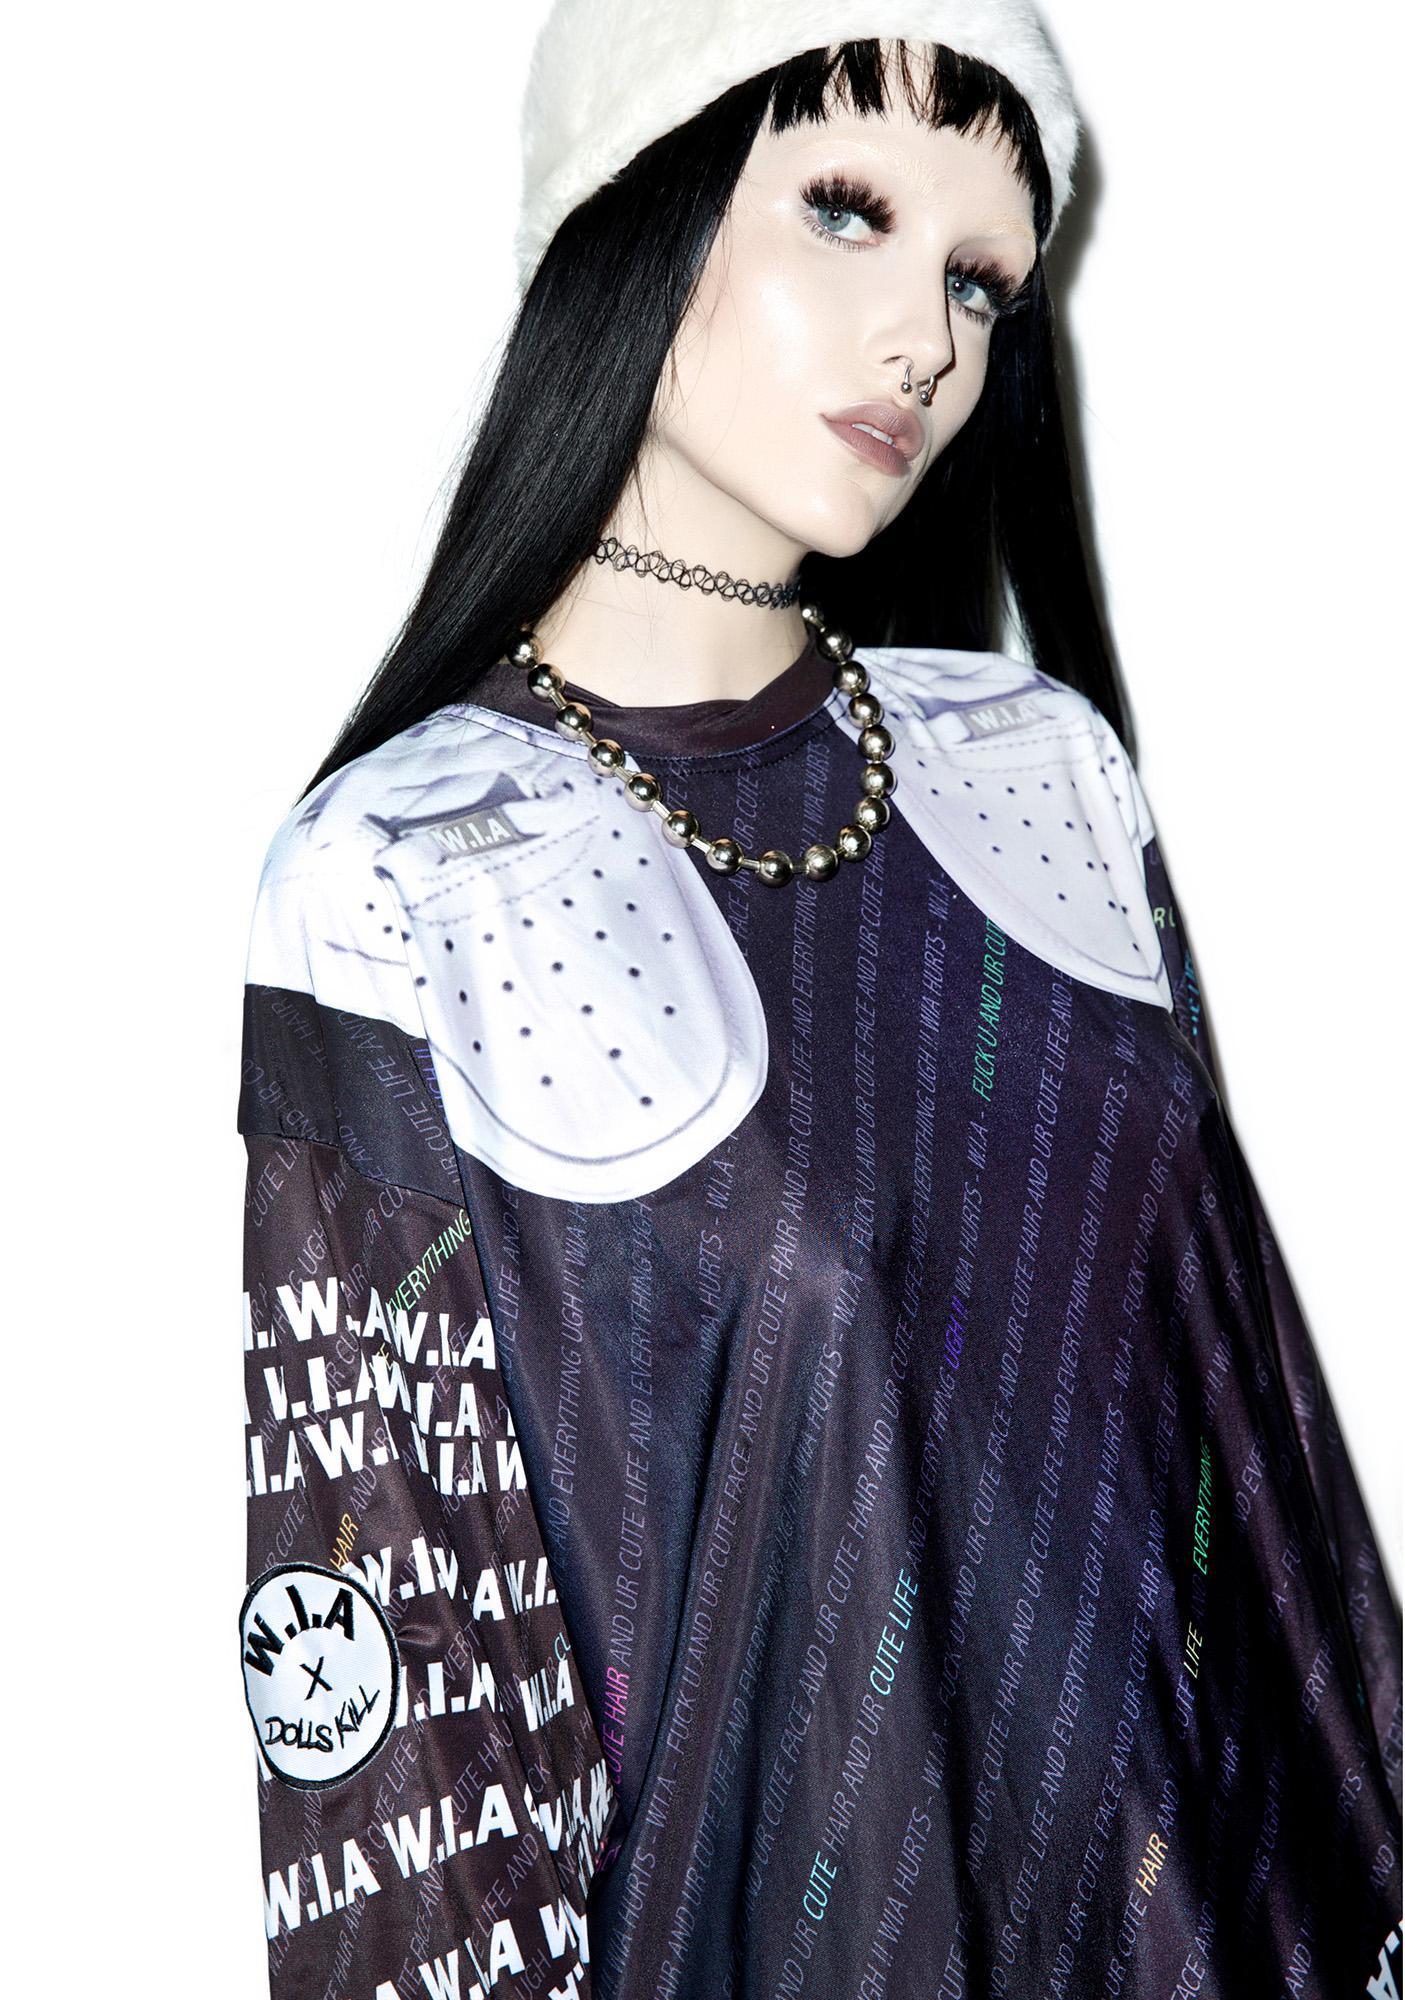 W.I.A X Dolls Kill Black W.I.A Extra Long T-Shirt